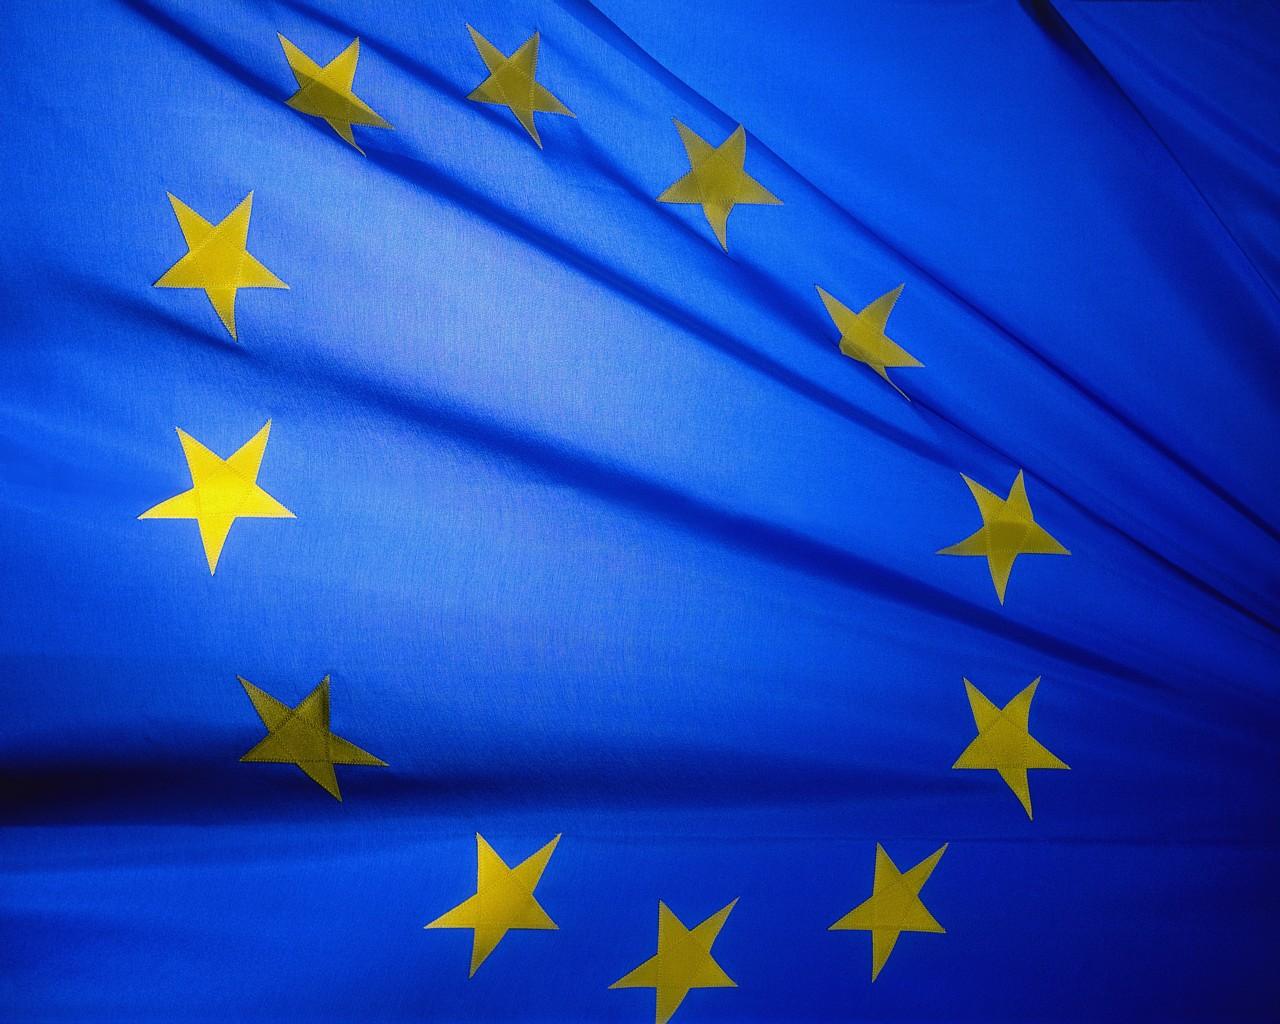 Узбекистан и ЕС обсудили соблюдение прав человека в Узбекистане